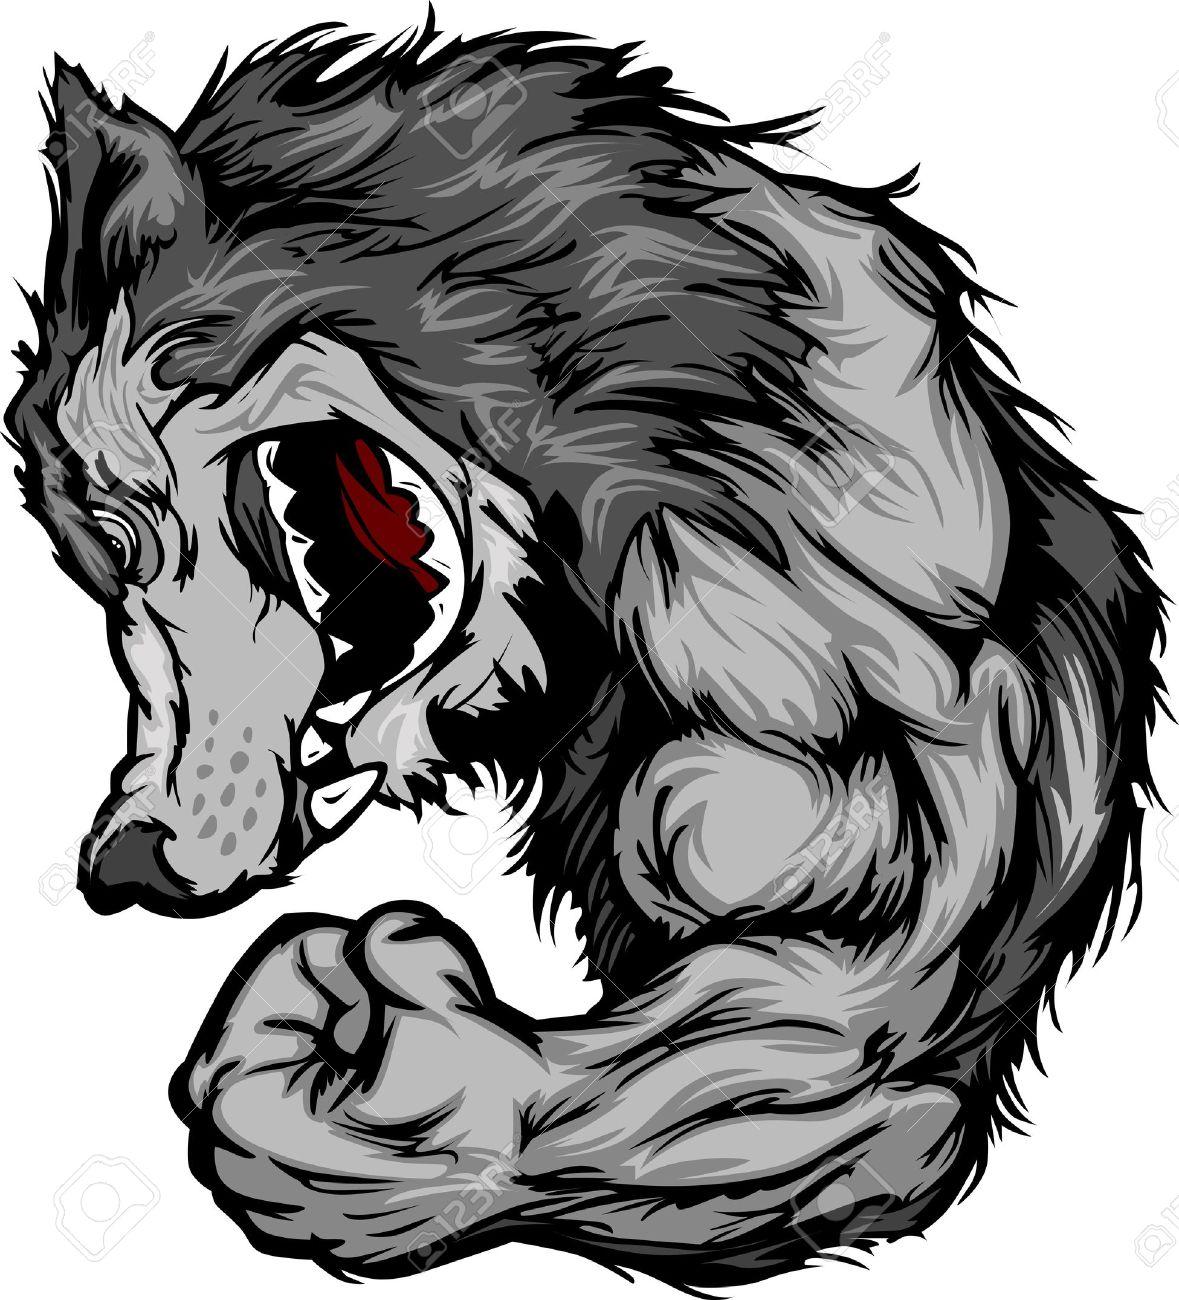 10343516-wolf-mascot-flexing-arm-cartoon